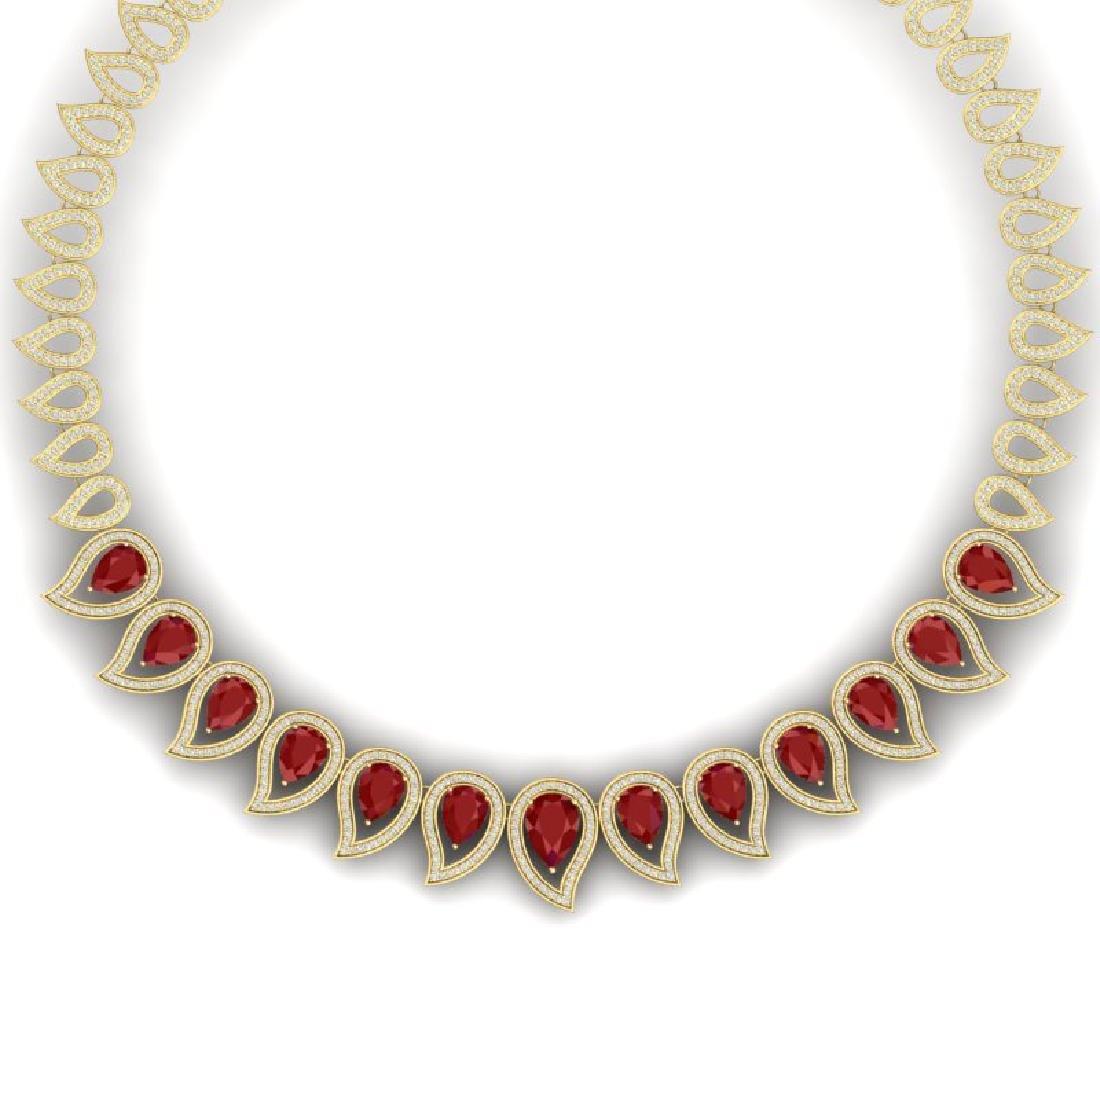 33.4 CTW Royalty Designer Ruby & VS Diamond Necklace